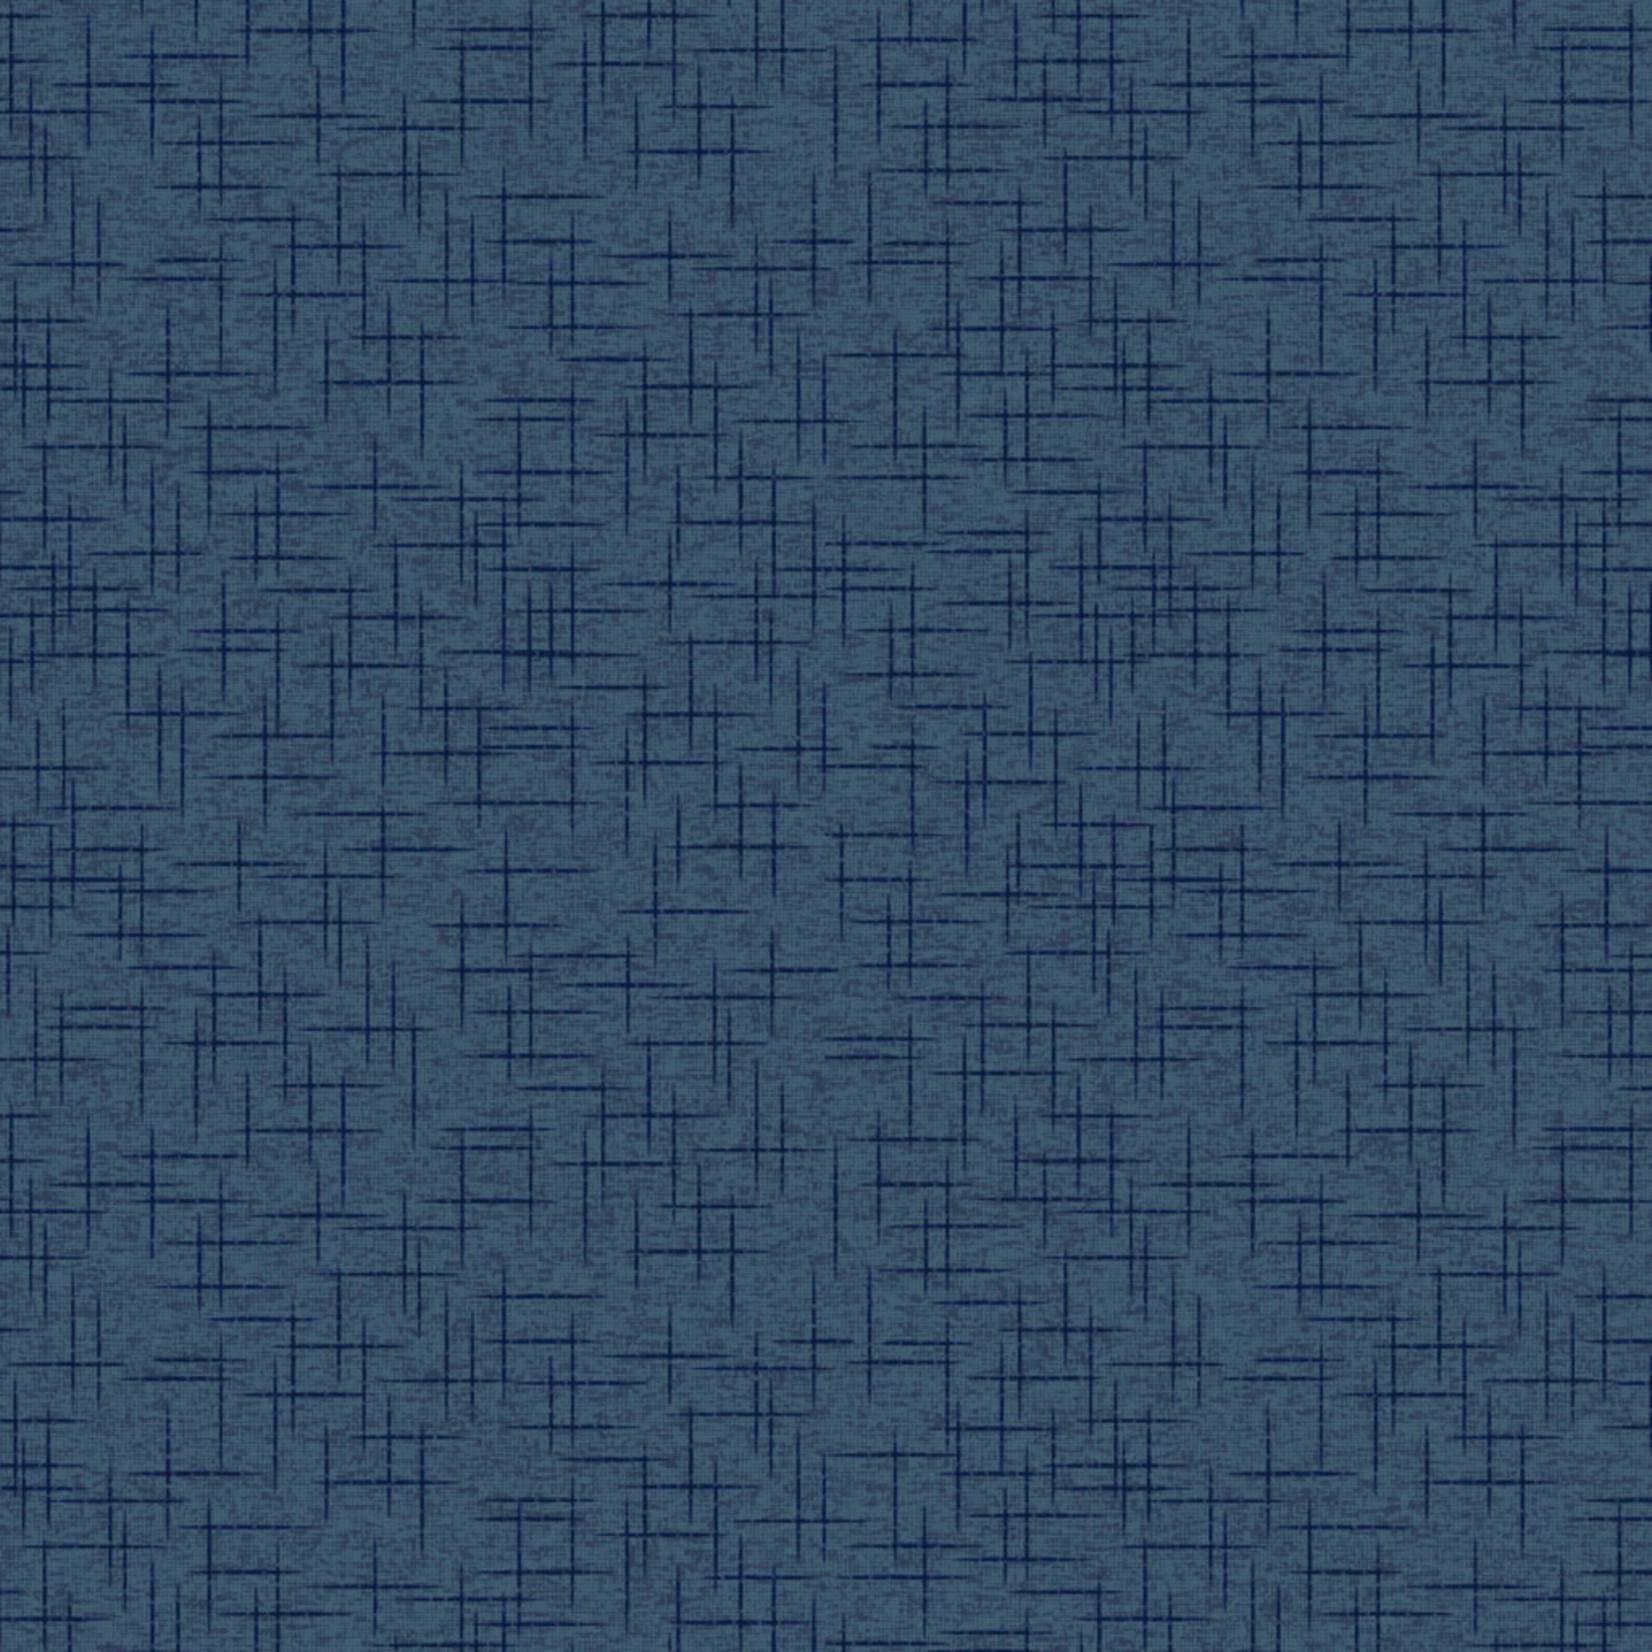 Maywood Studio Make Yourself at Home - Texture - Dark Blue